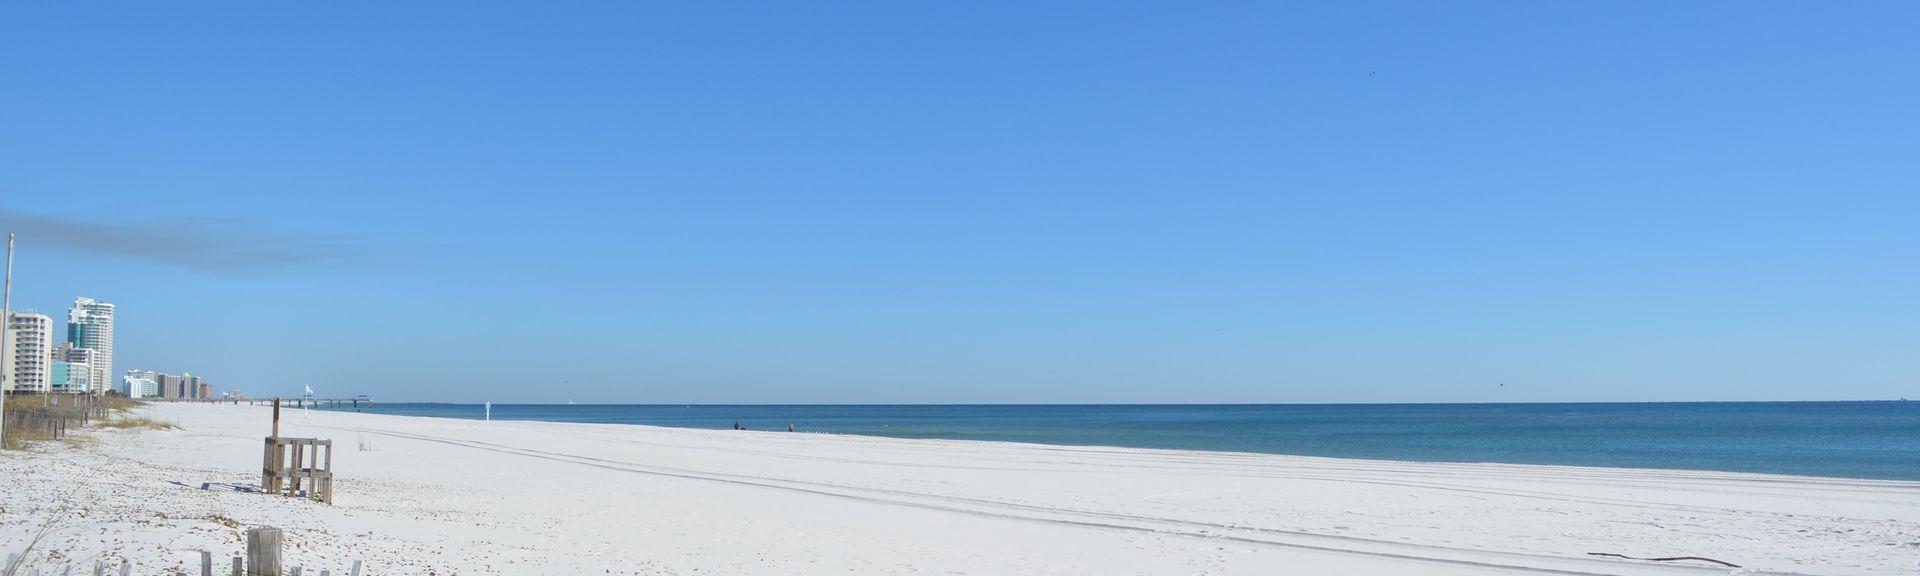 The Enclave, Orange Beach, Alabama, United States of America